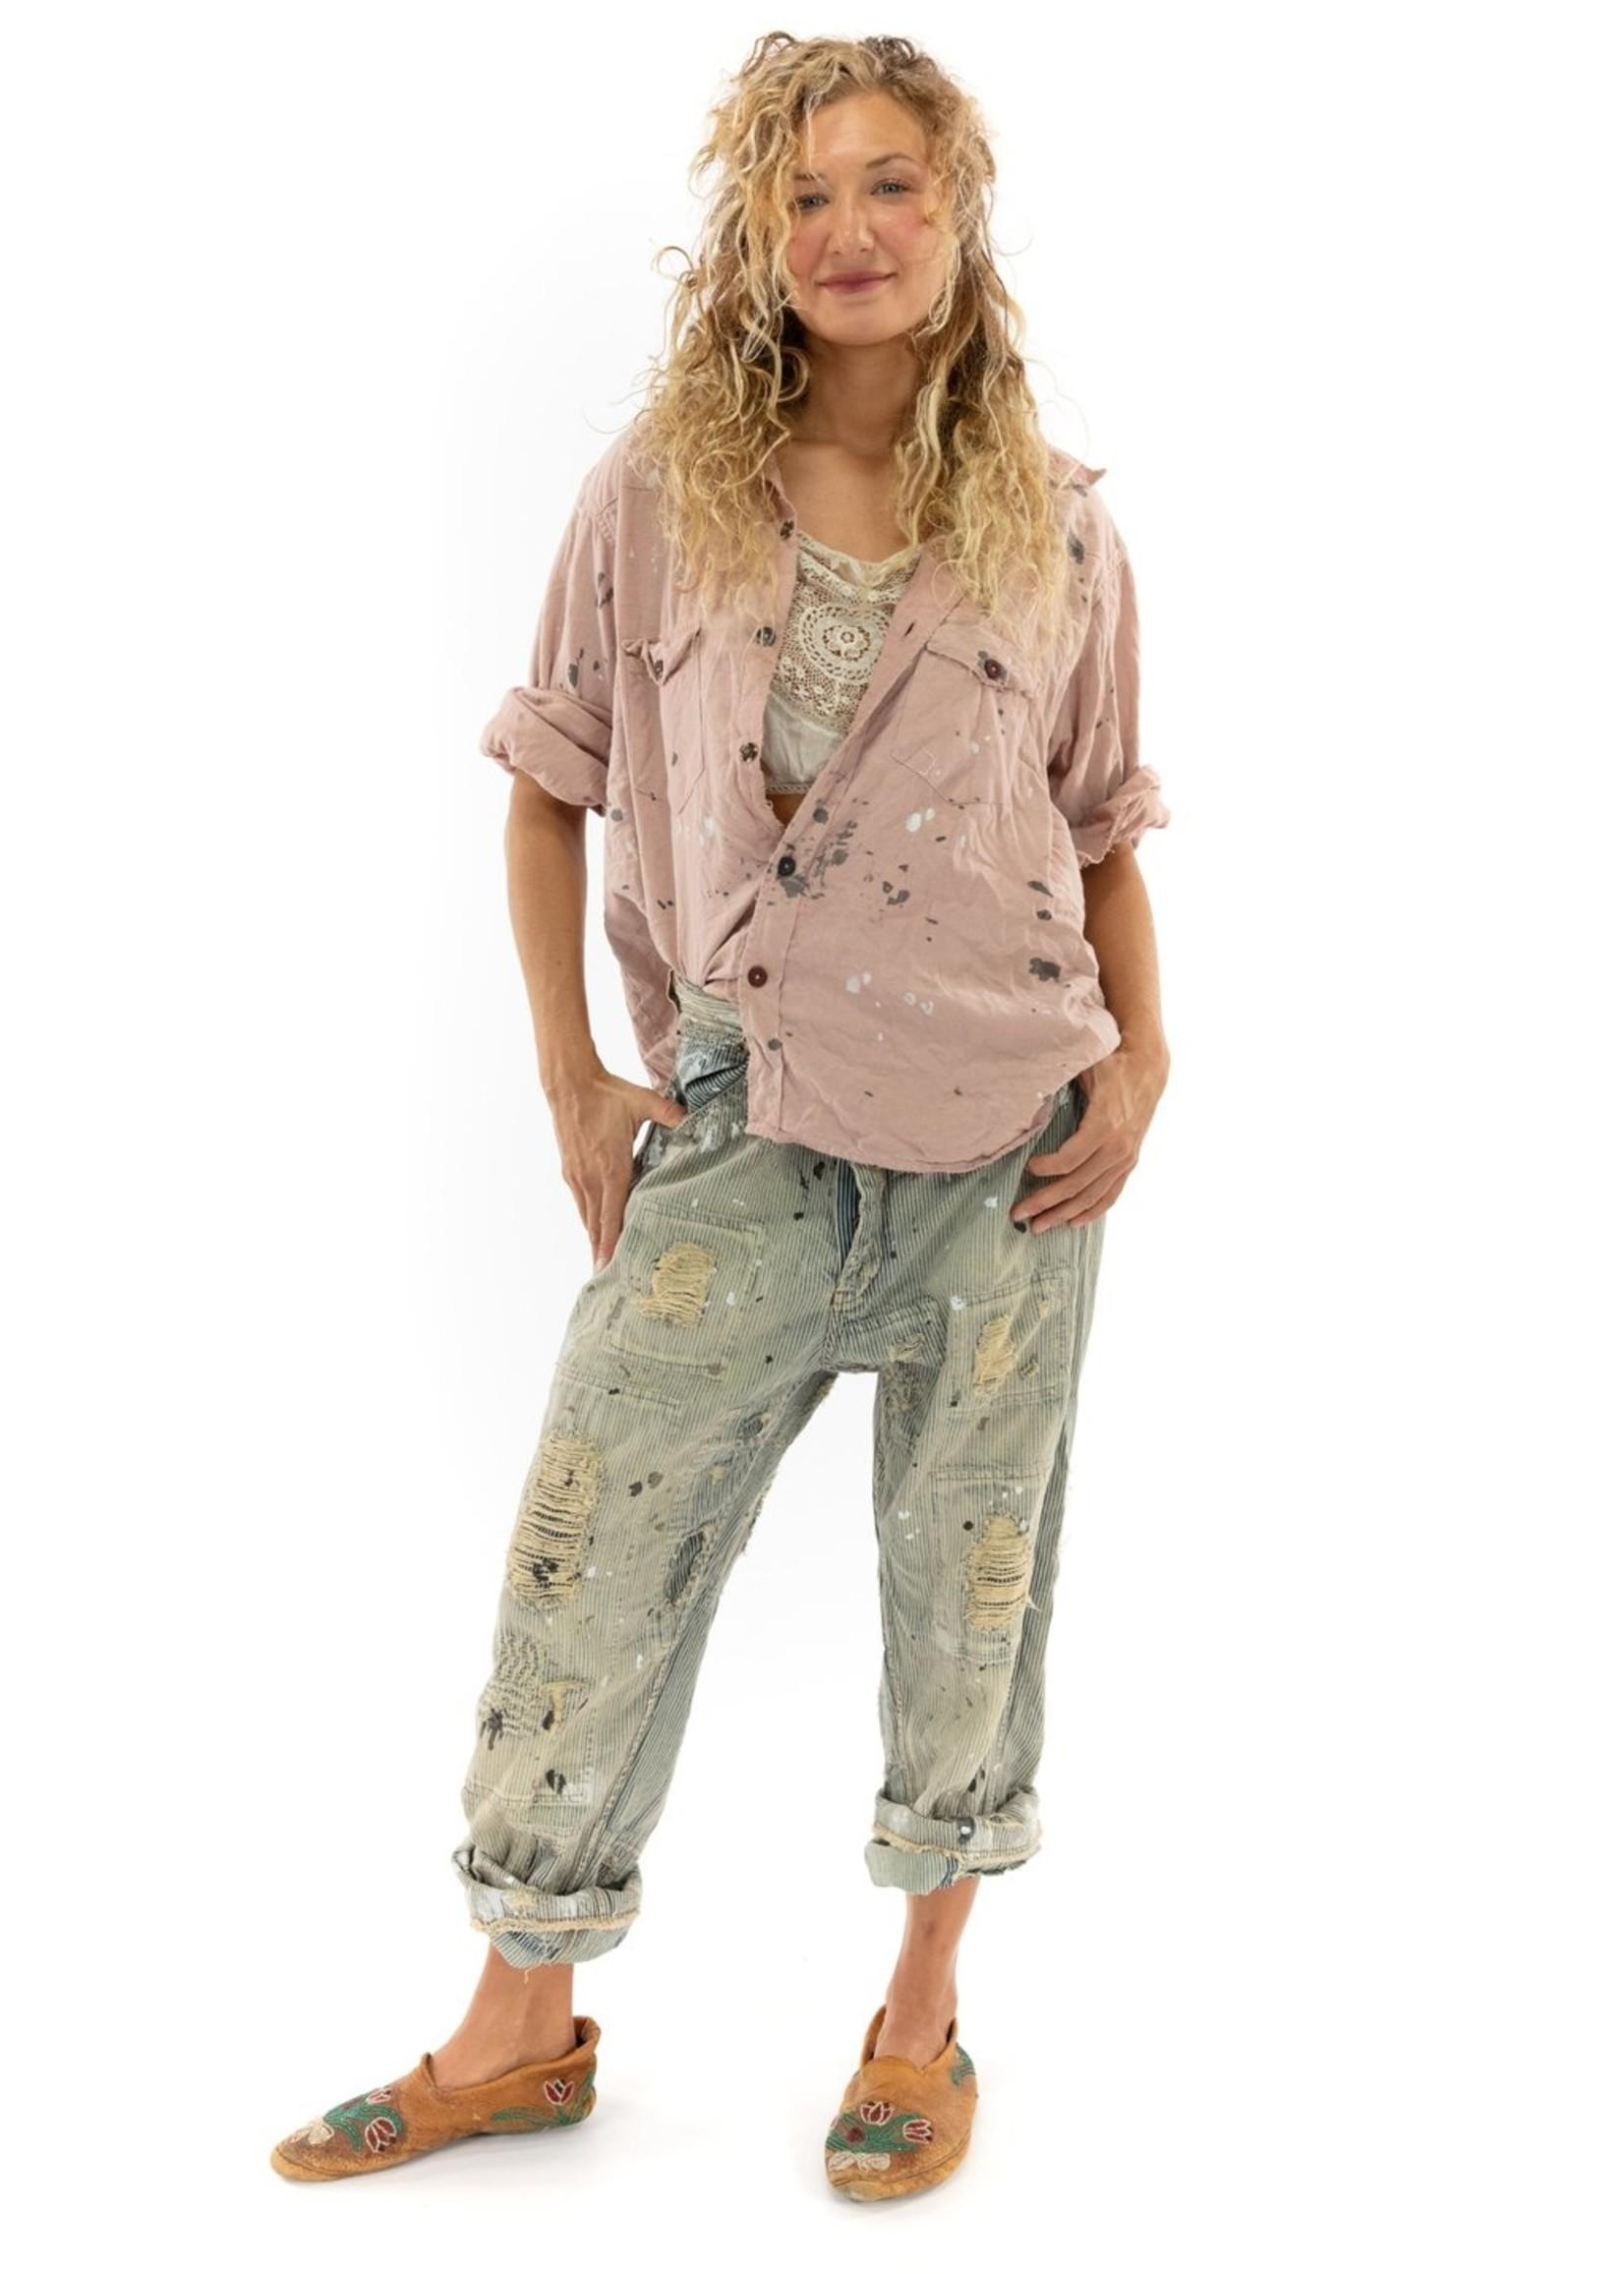 Magnolia Pearl Kelly Western Shirt Love Embro - Bisou